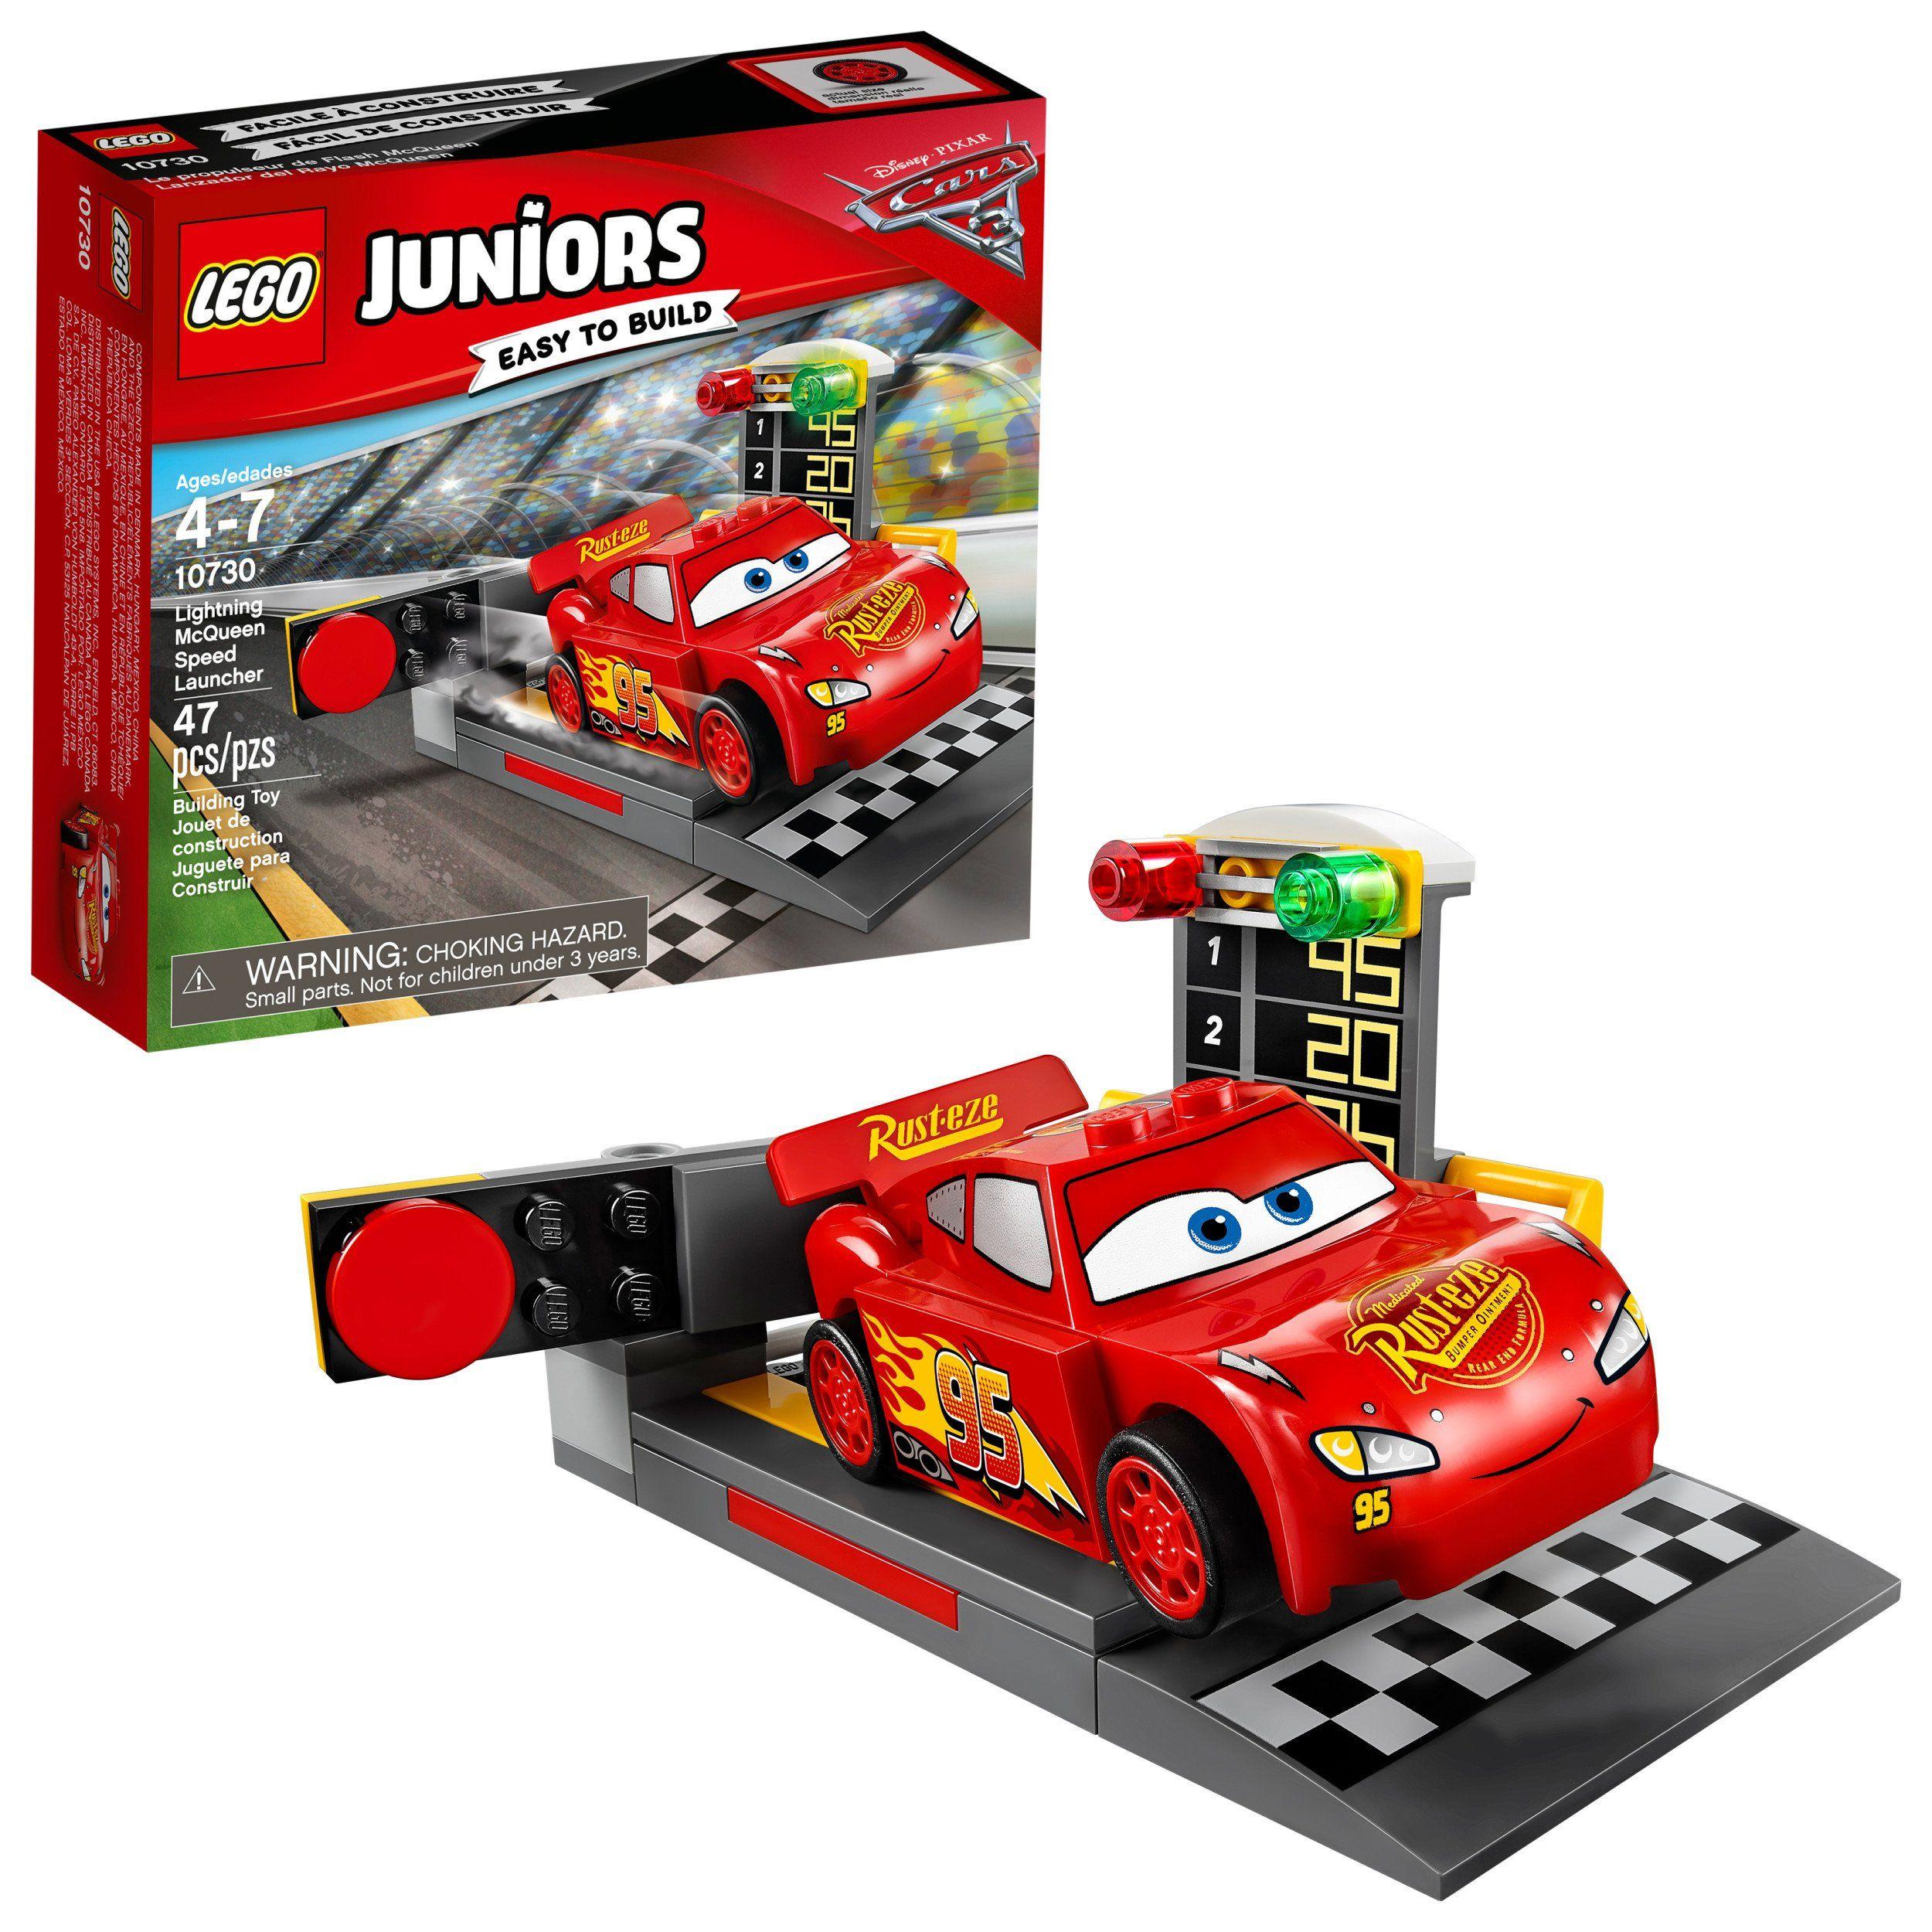 Pin By Brilliant Hippie On Brilliant Hippie Accessories Lego Juniors Cars 3 Lightning Mcqueen Lego